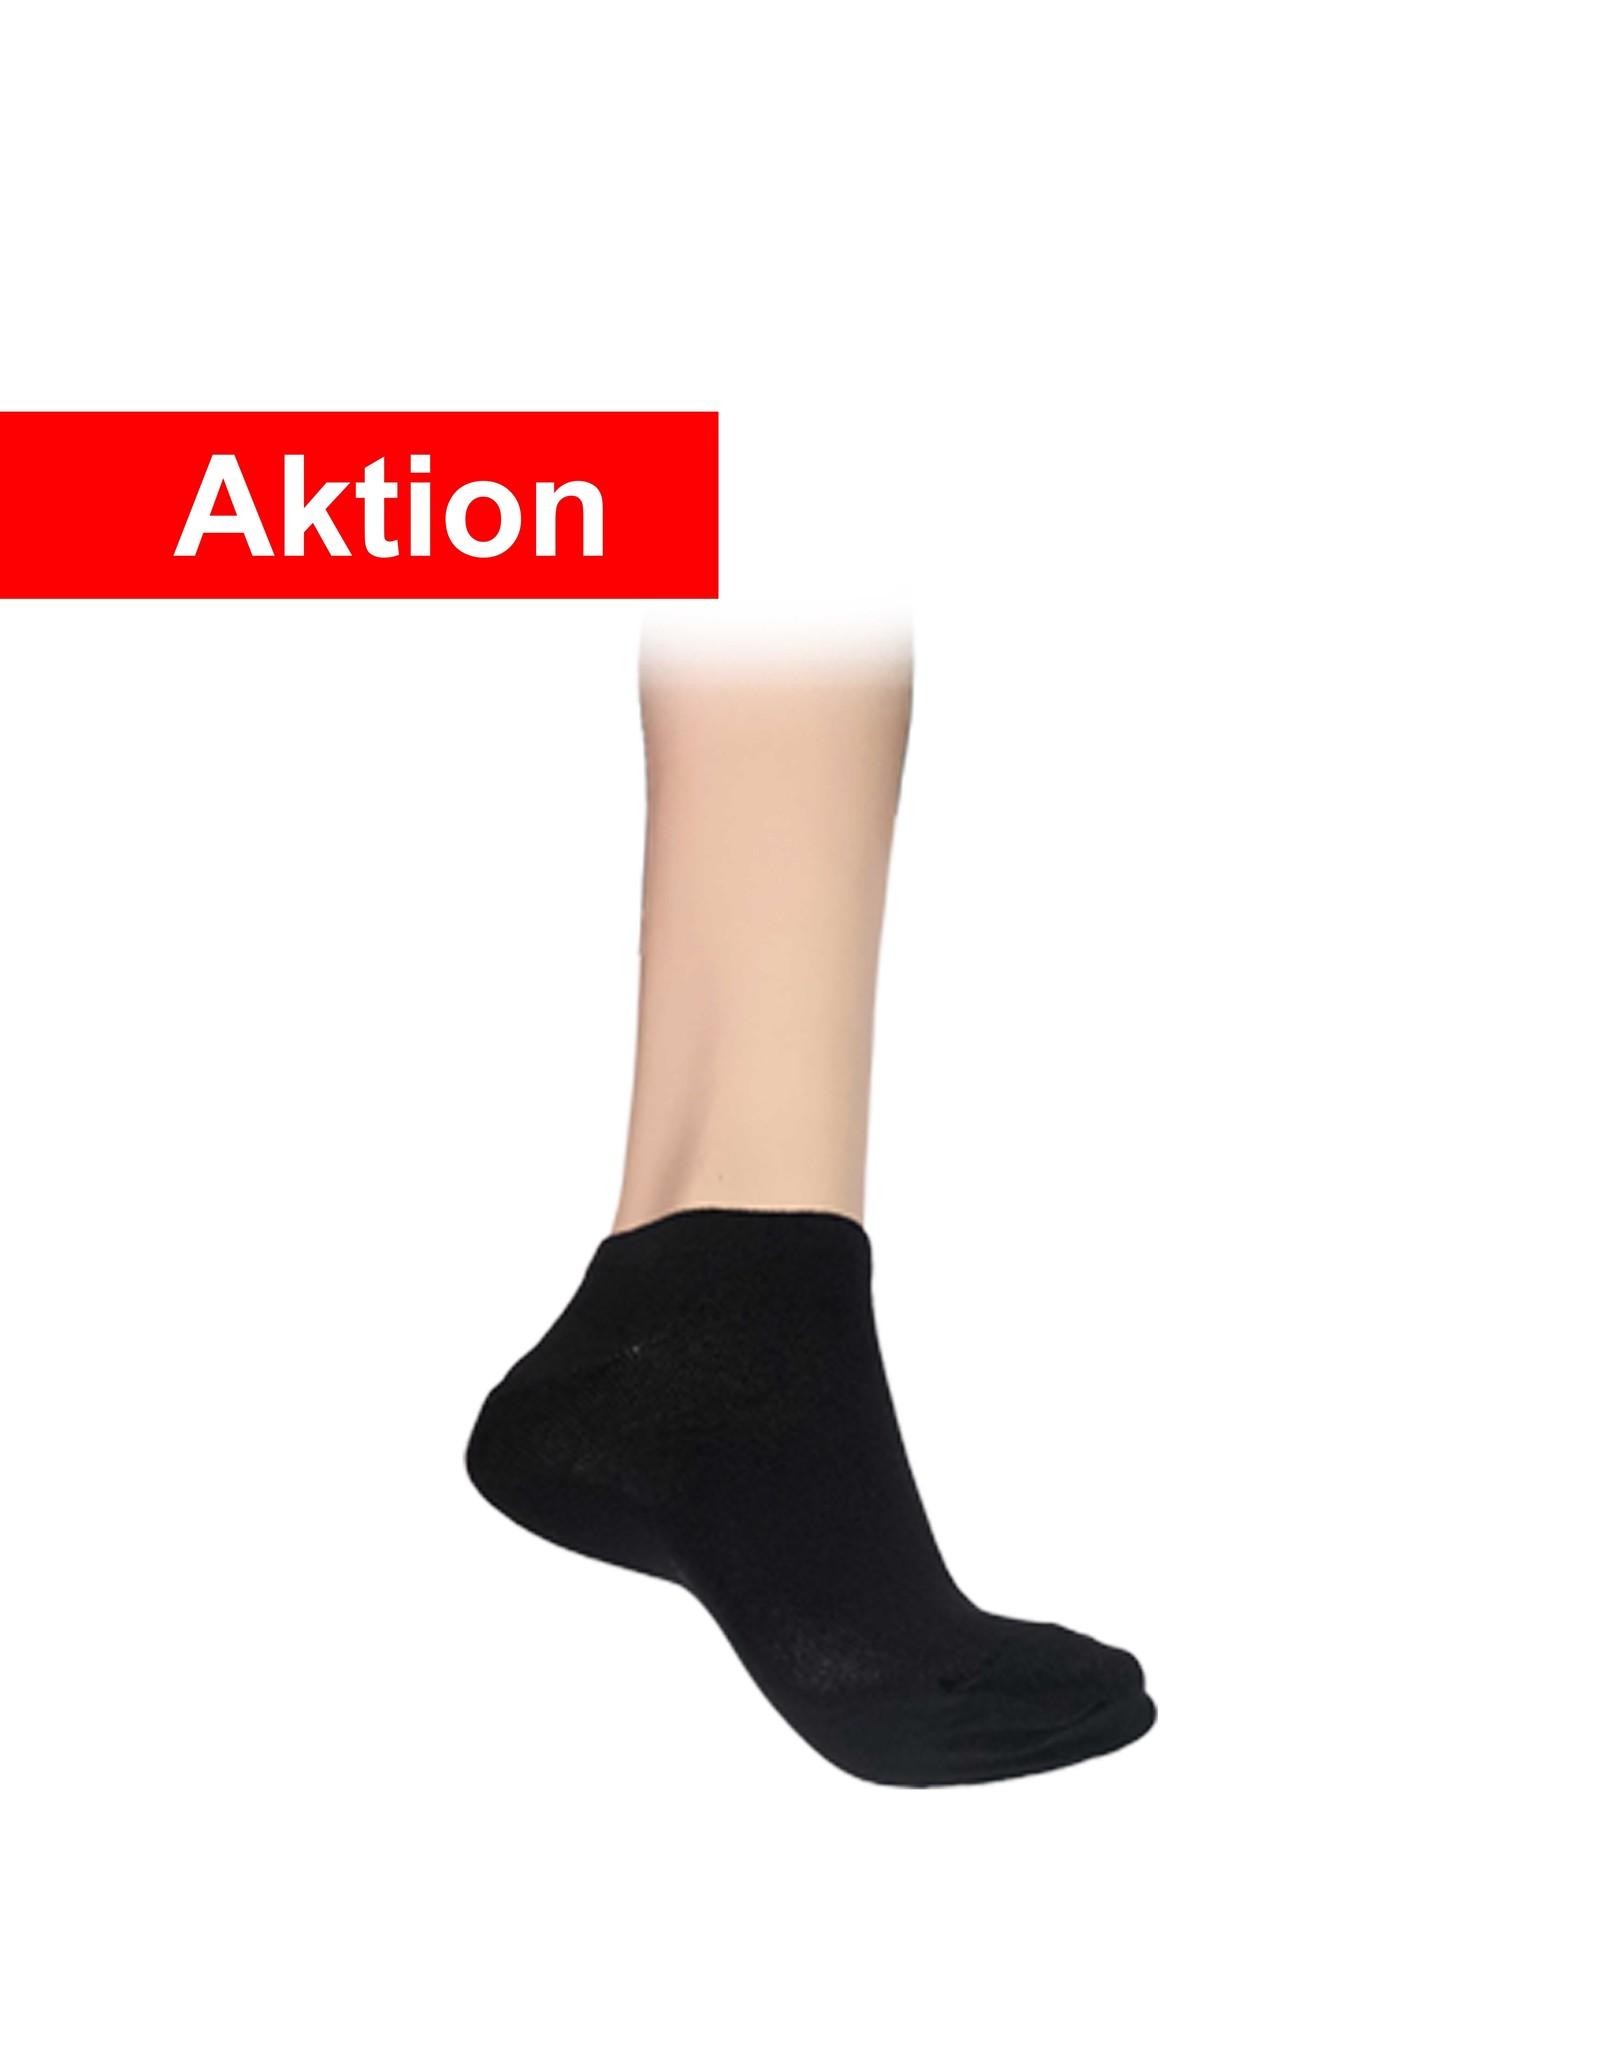 10 Paar Sneaker II Socken  - schwarz